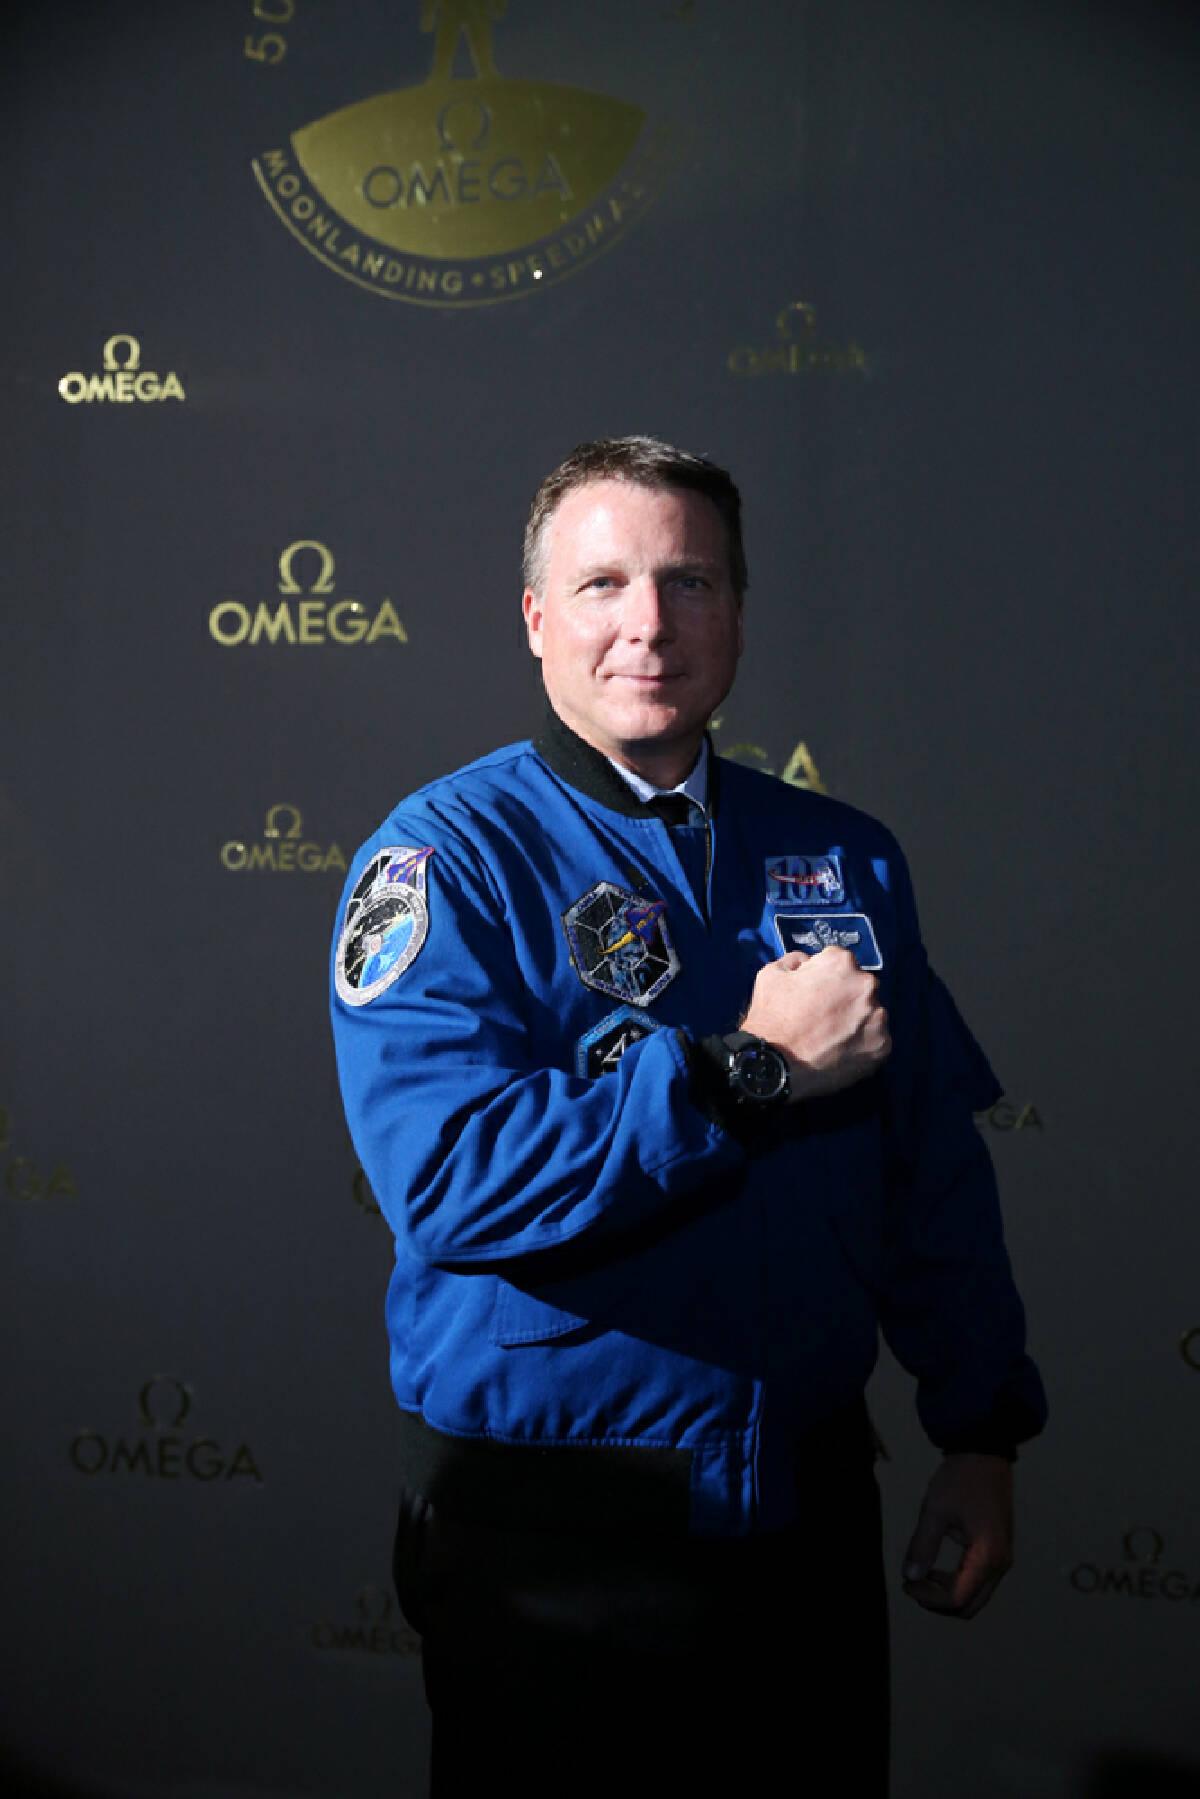 Omega goes lunar for moon-landing anniversary